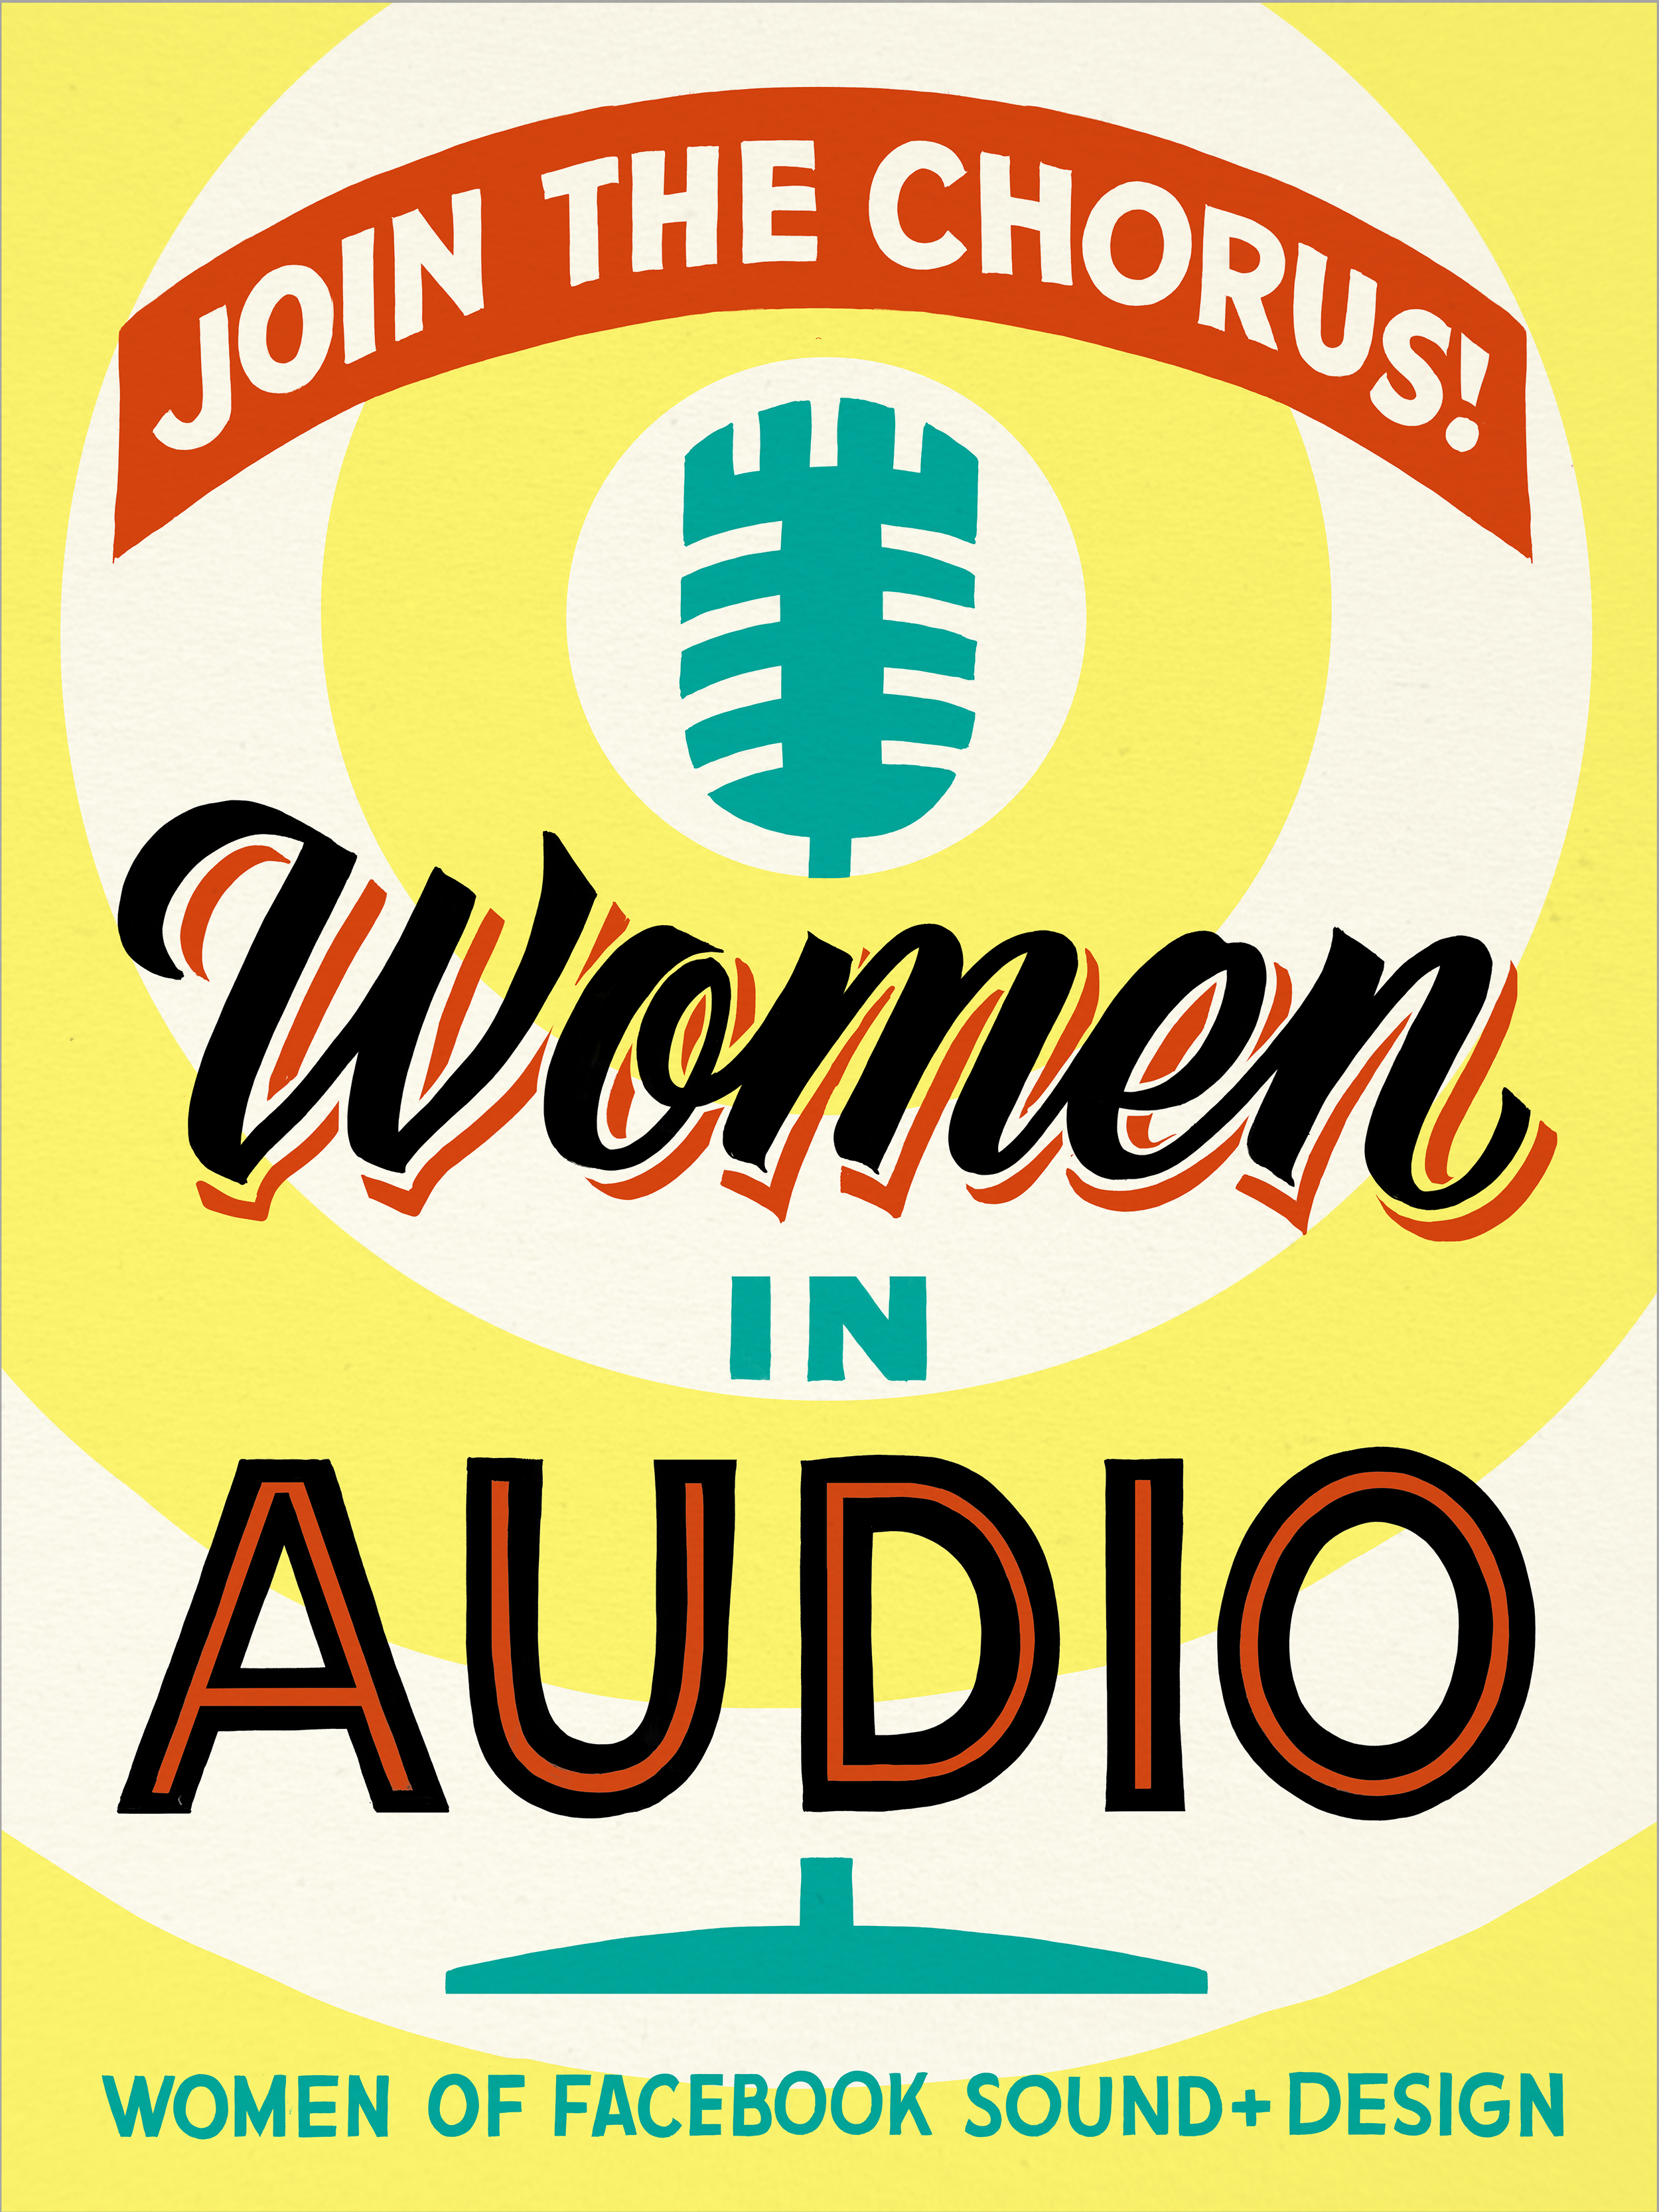 FBwomen_in_Audio_squarespace.jpg